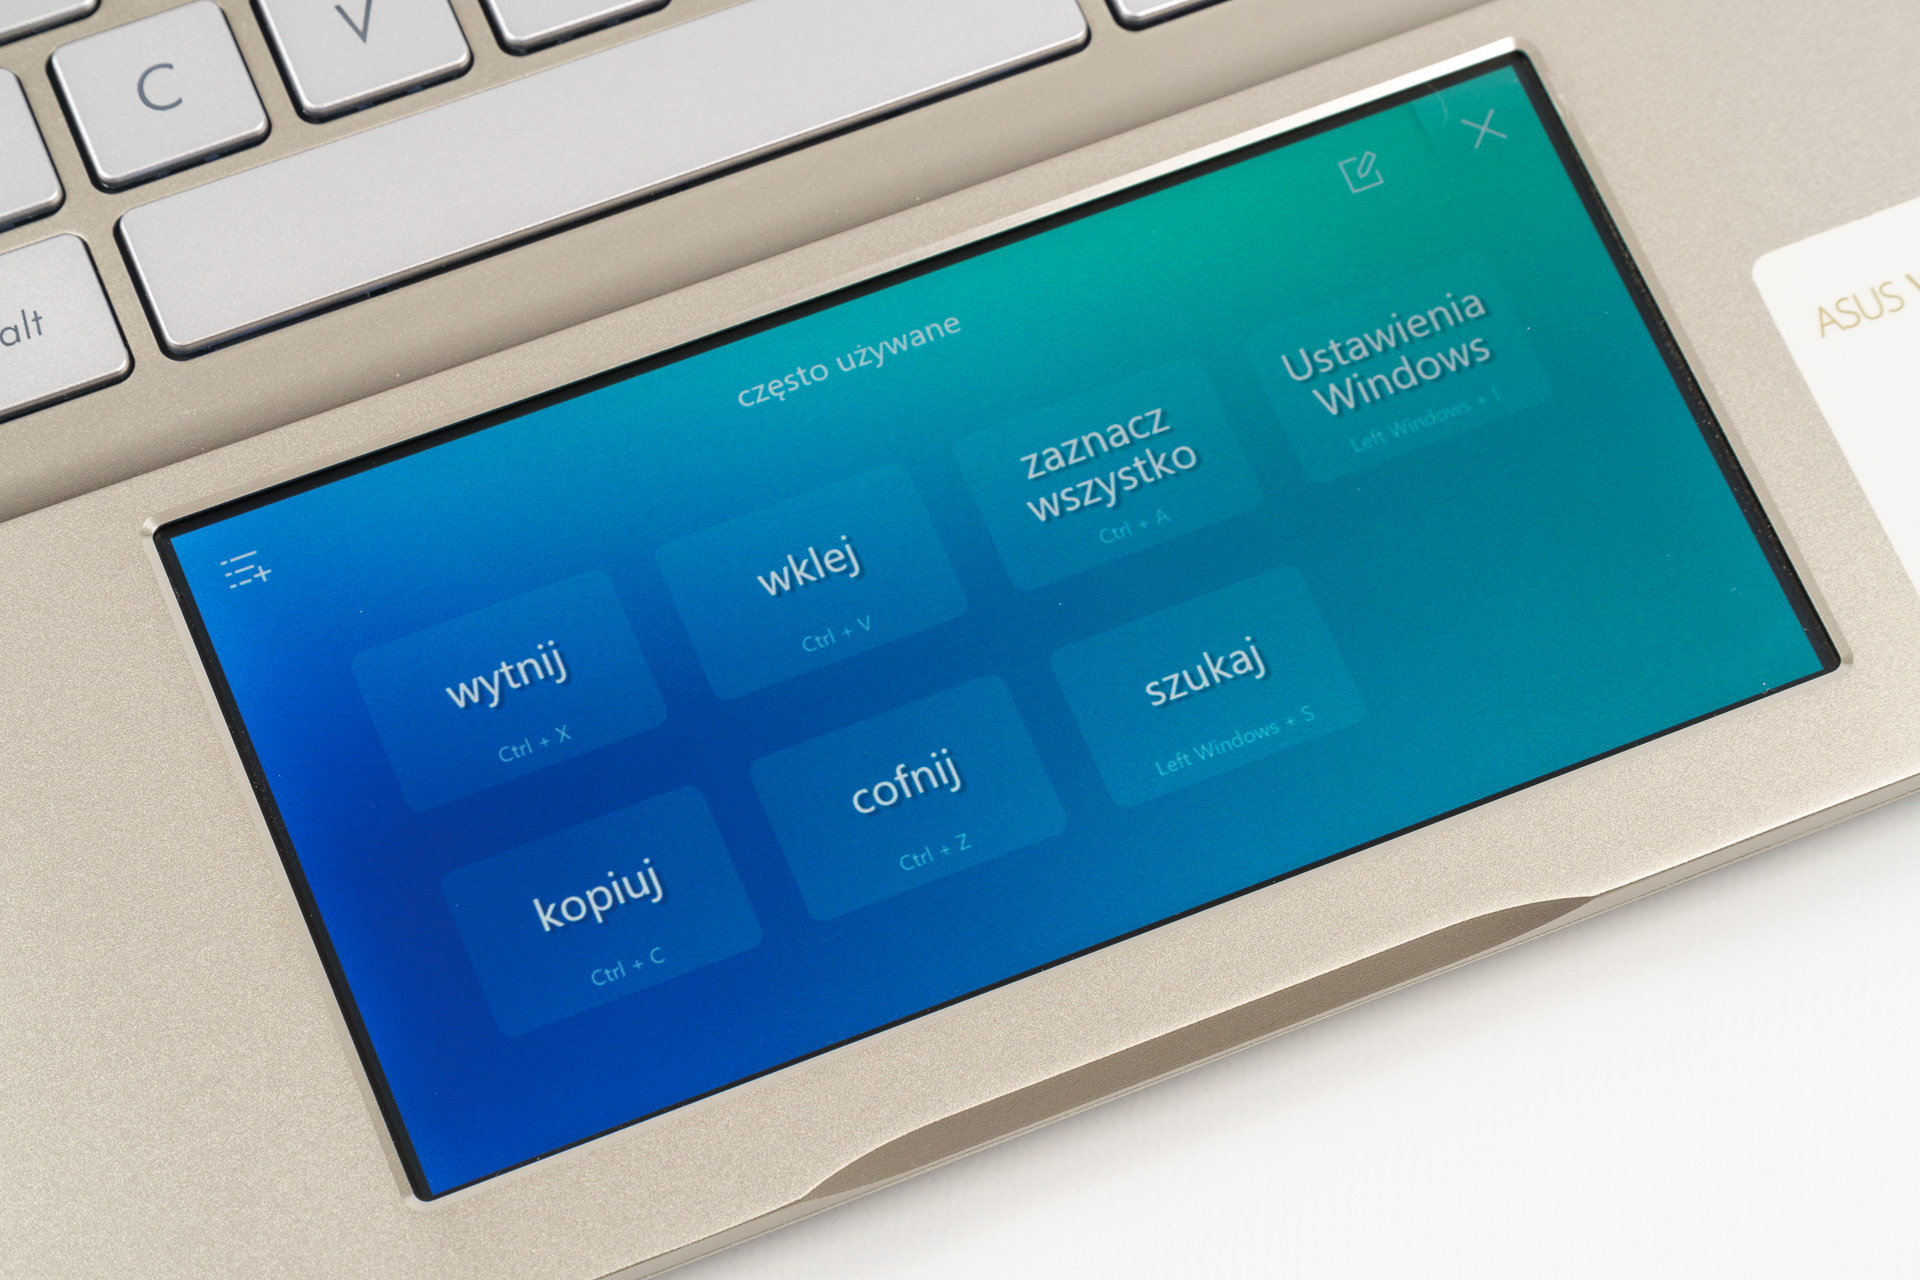 Asus VivoBook ze ScreenPadem, czyli po co w notebooku drugi ekran? 25